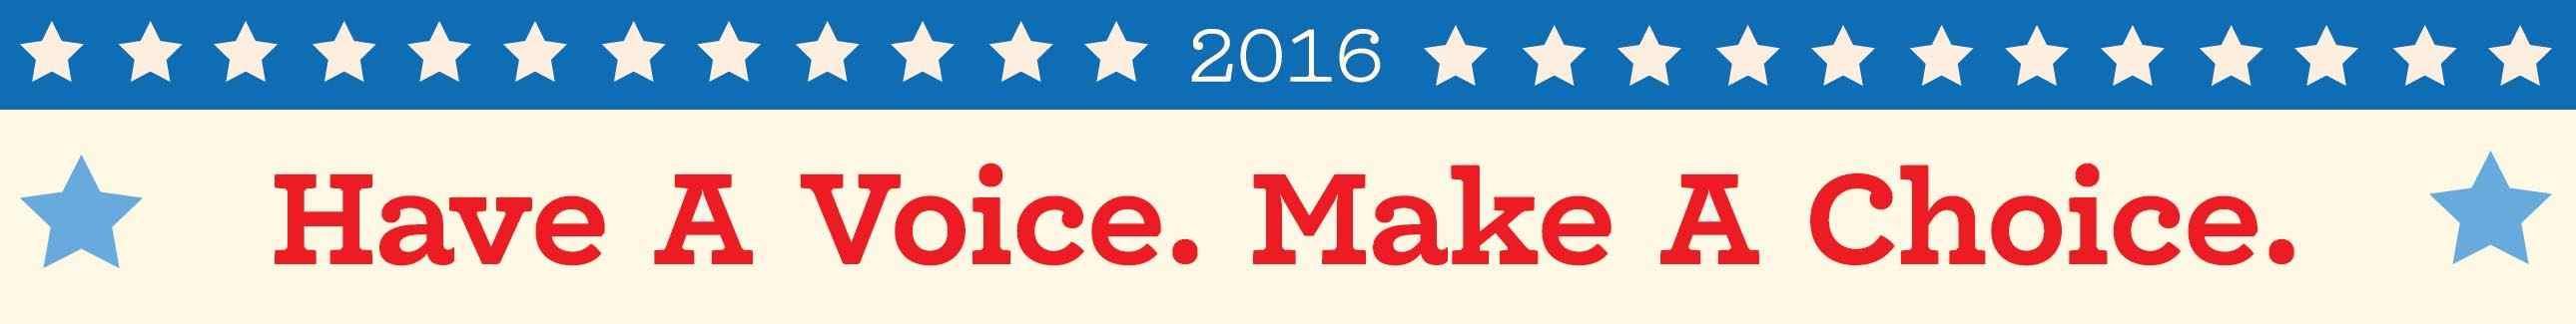 Elections_Short_Mantle_2X